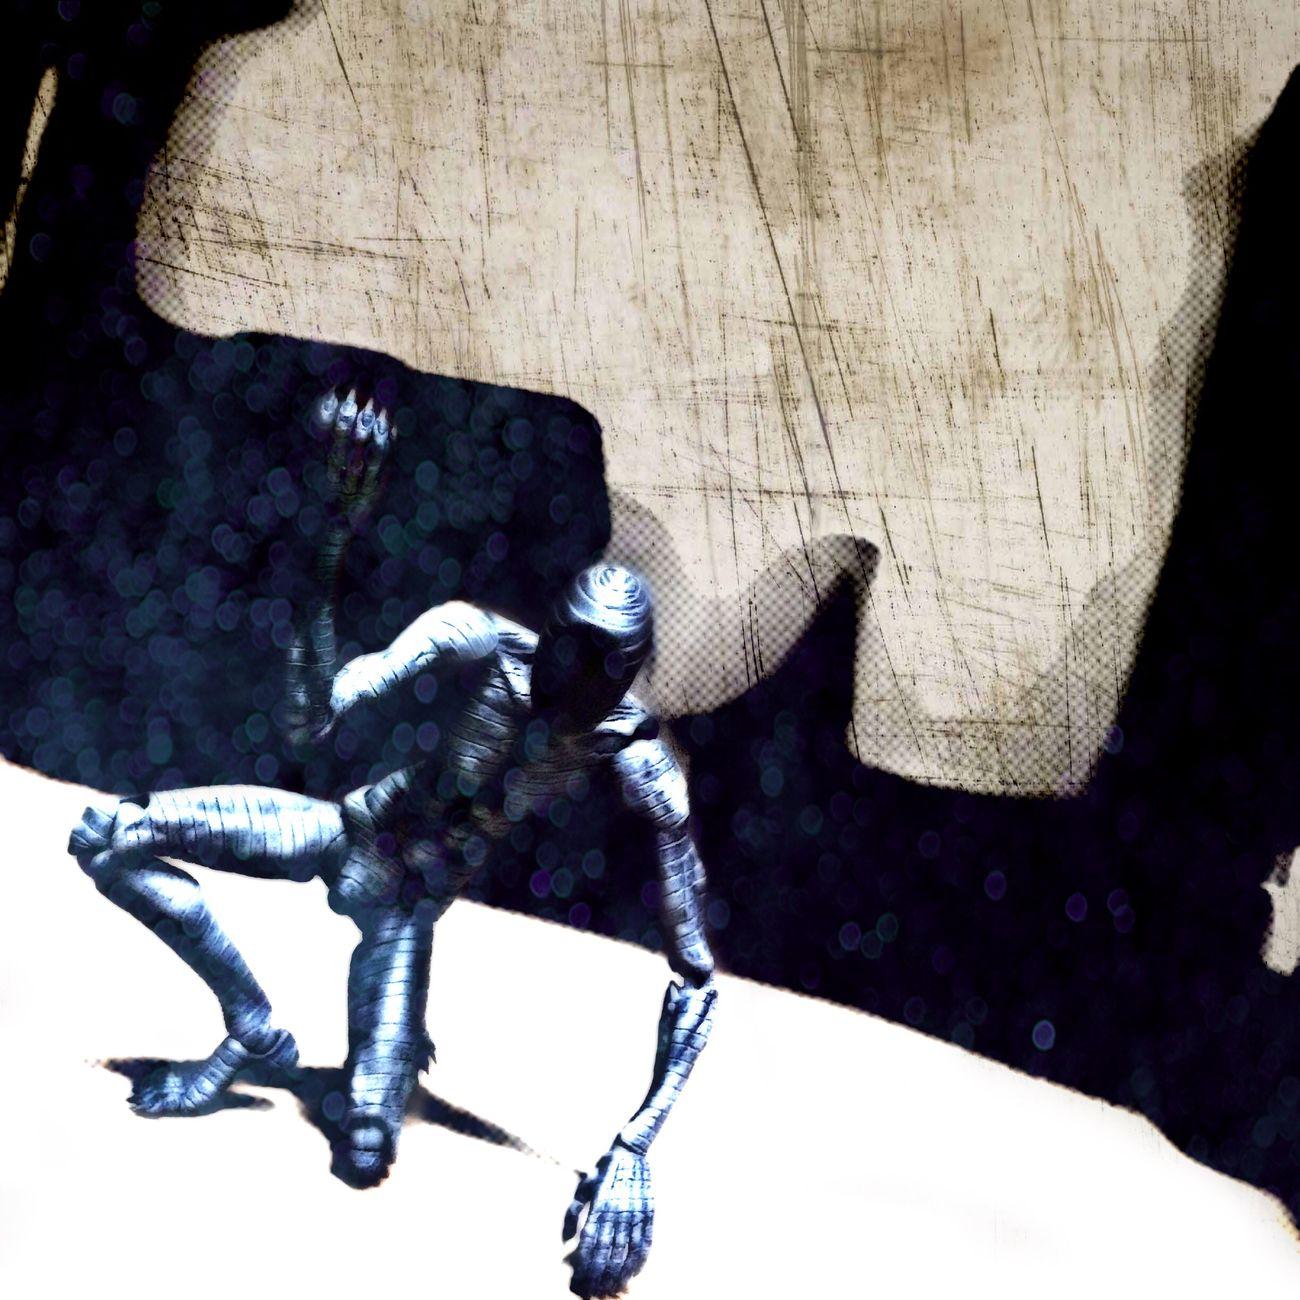 Ajin-IBM(Invisible Black Matter) Toyartistry Toyunion Toyelites Toysaremydrug Toydiscovery Toyhumor Toycommunity Toyark Toyslagram Toys4life Toycrewbuddies IBM Toptoyphotos Manga AJIN Anime Toyartistry_elite Ata_dreadnoughts Toyphotography Toysnapshot Epictoyart Figurefie